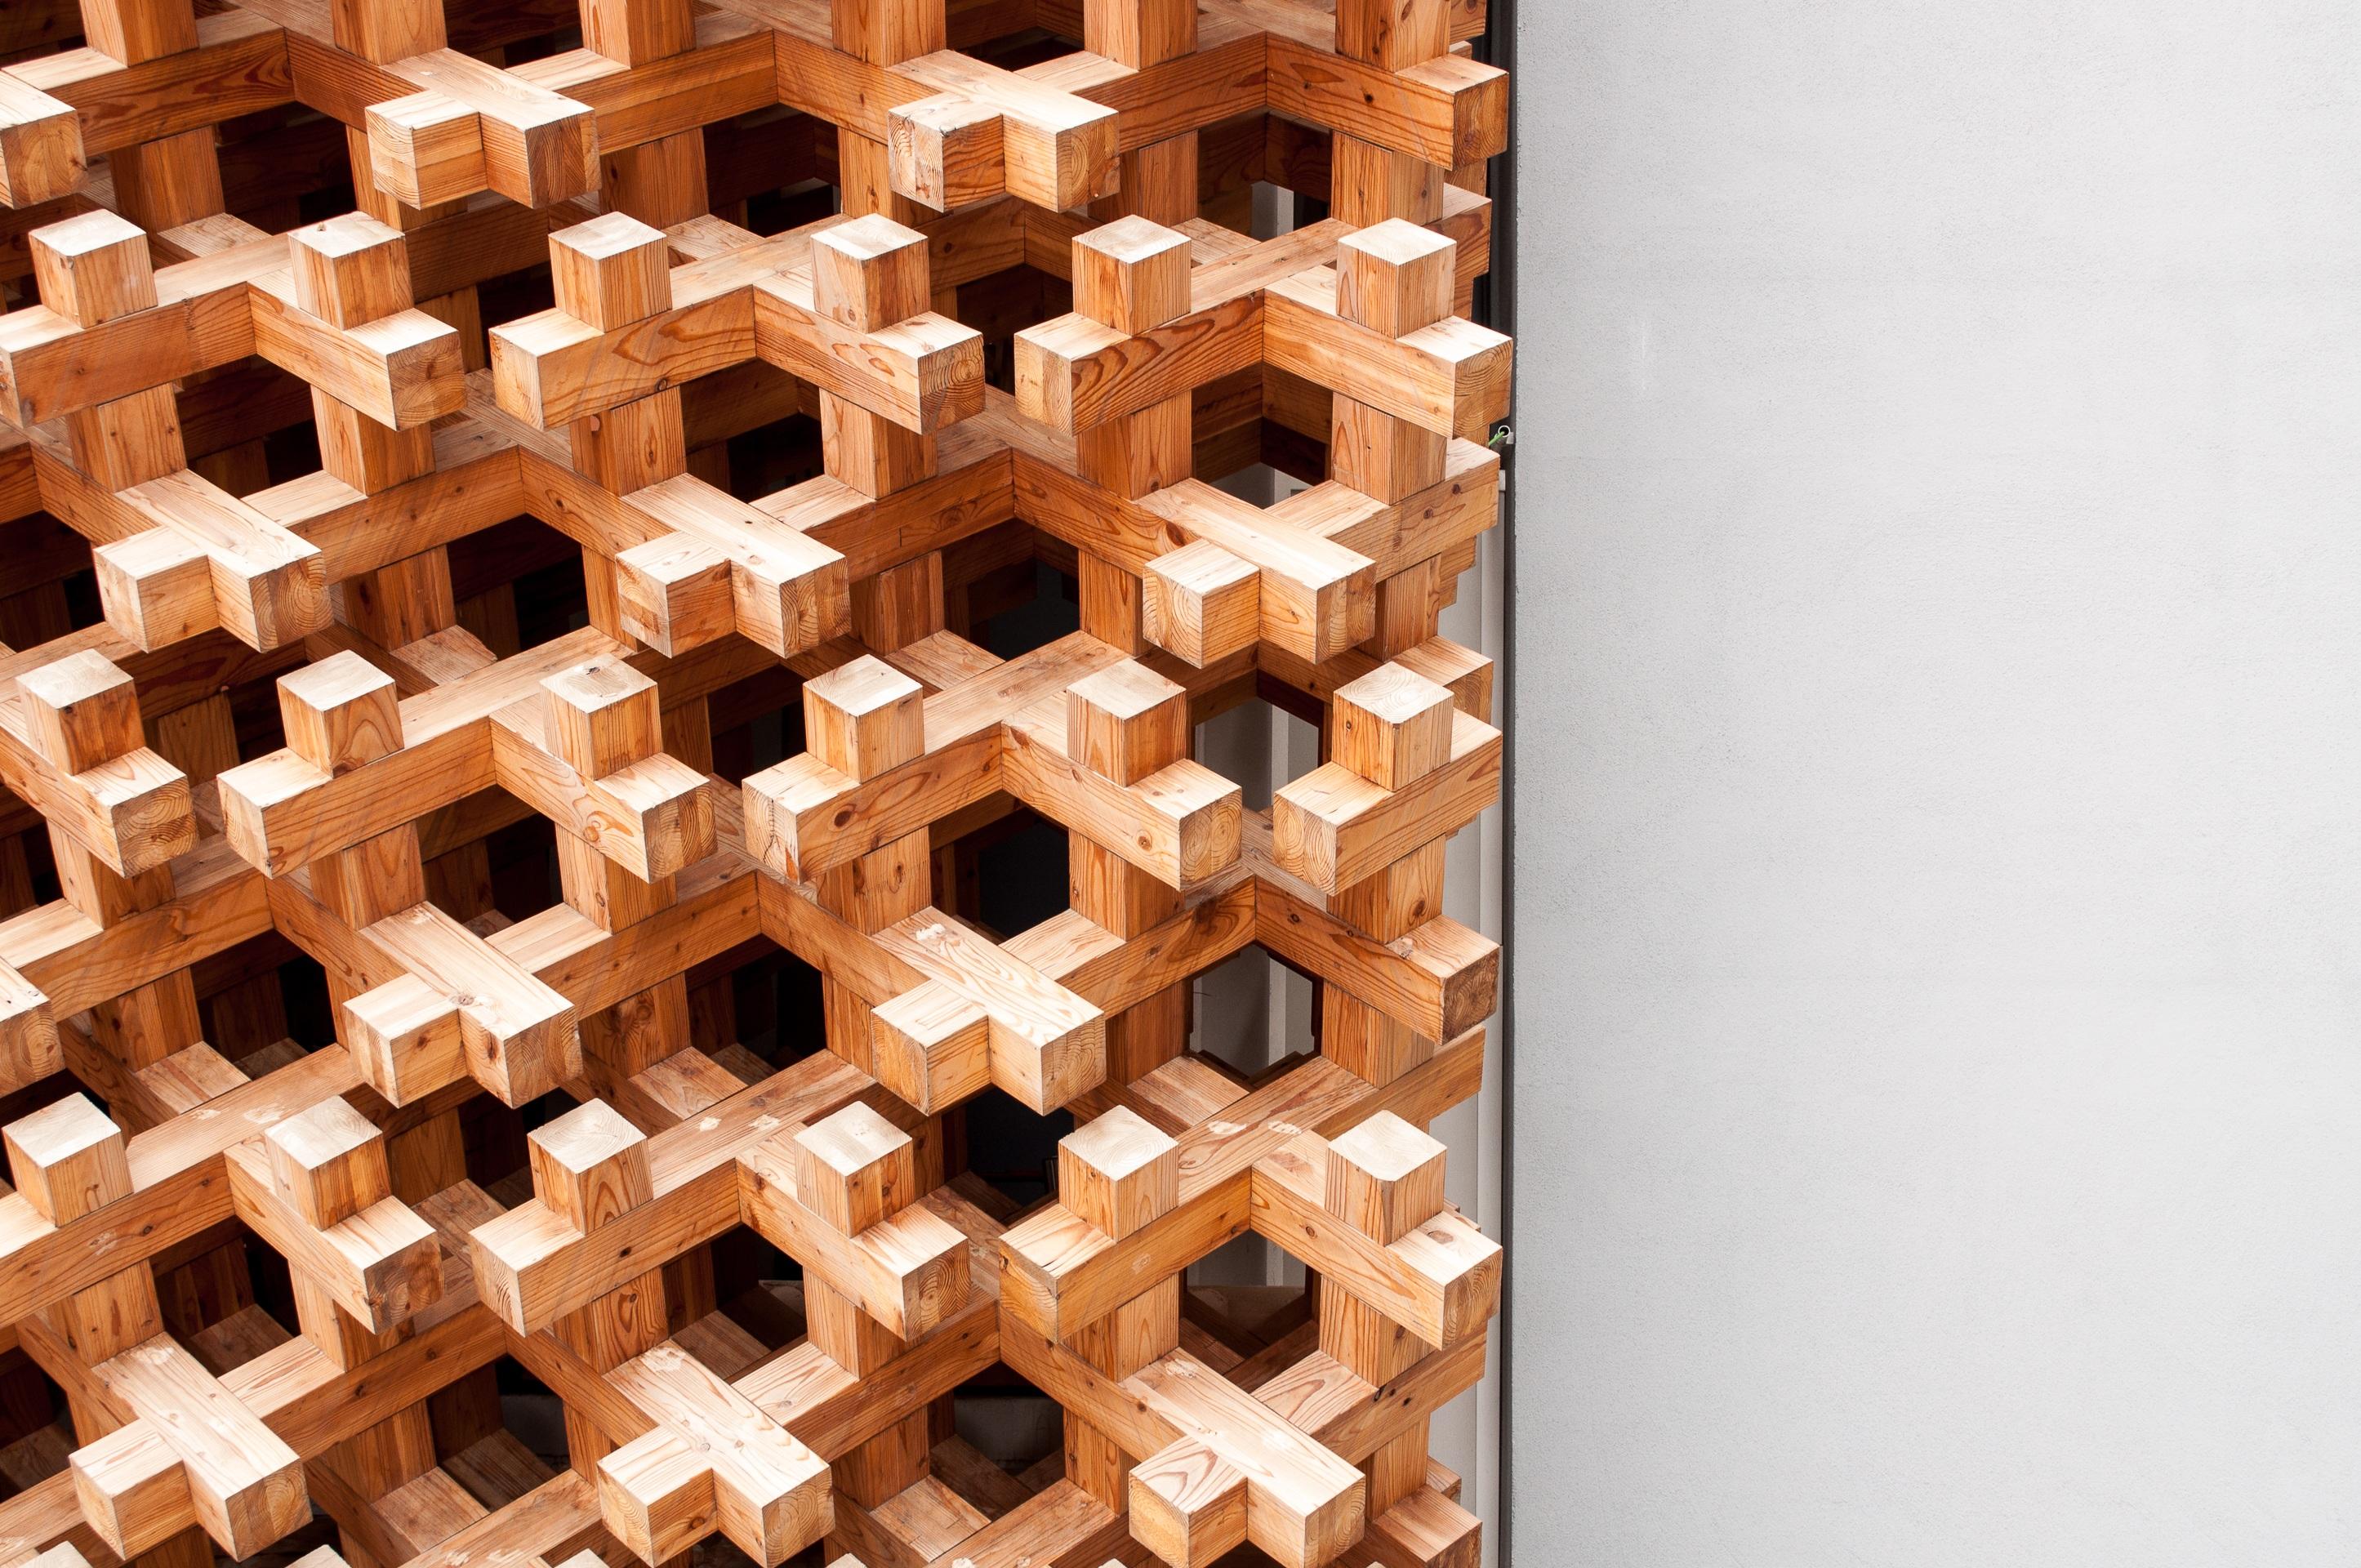 Wood Texture Floor Wall Pattern Brown Tile Japan Brick Material Circle Interior Design Art Shadows